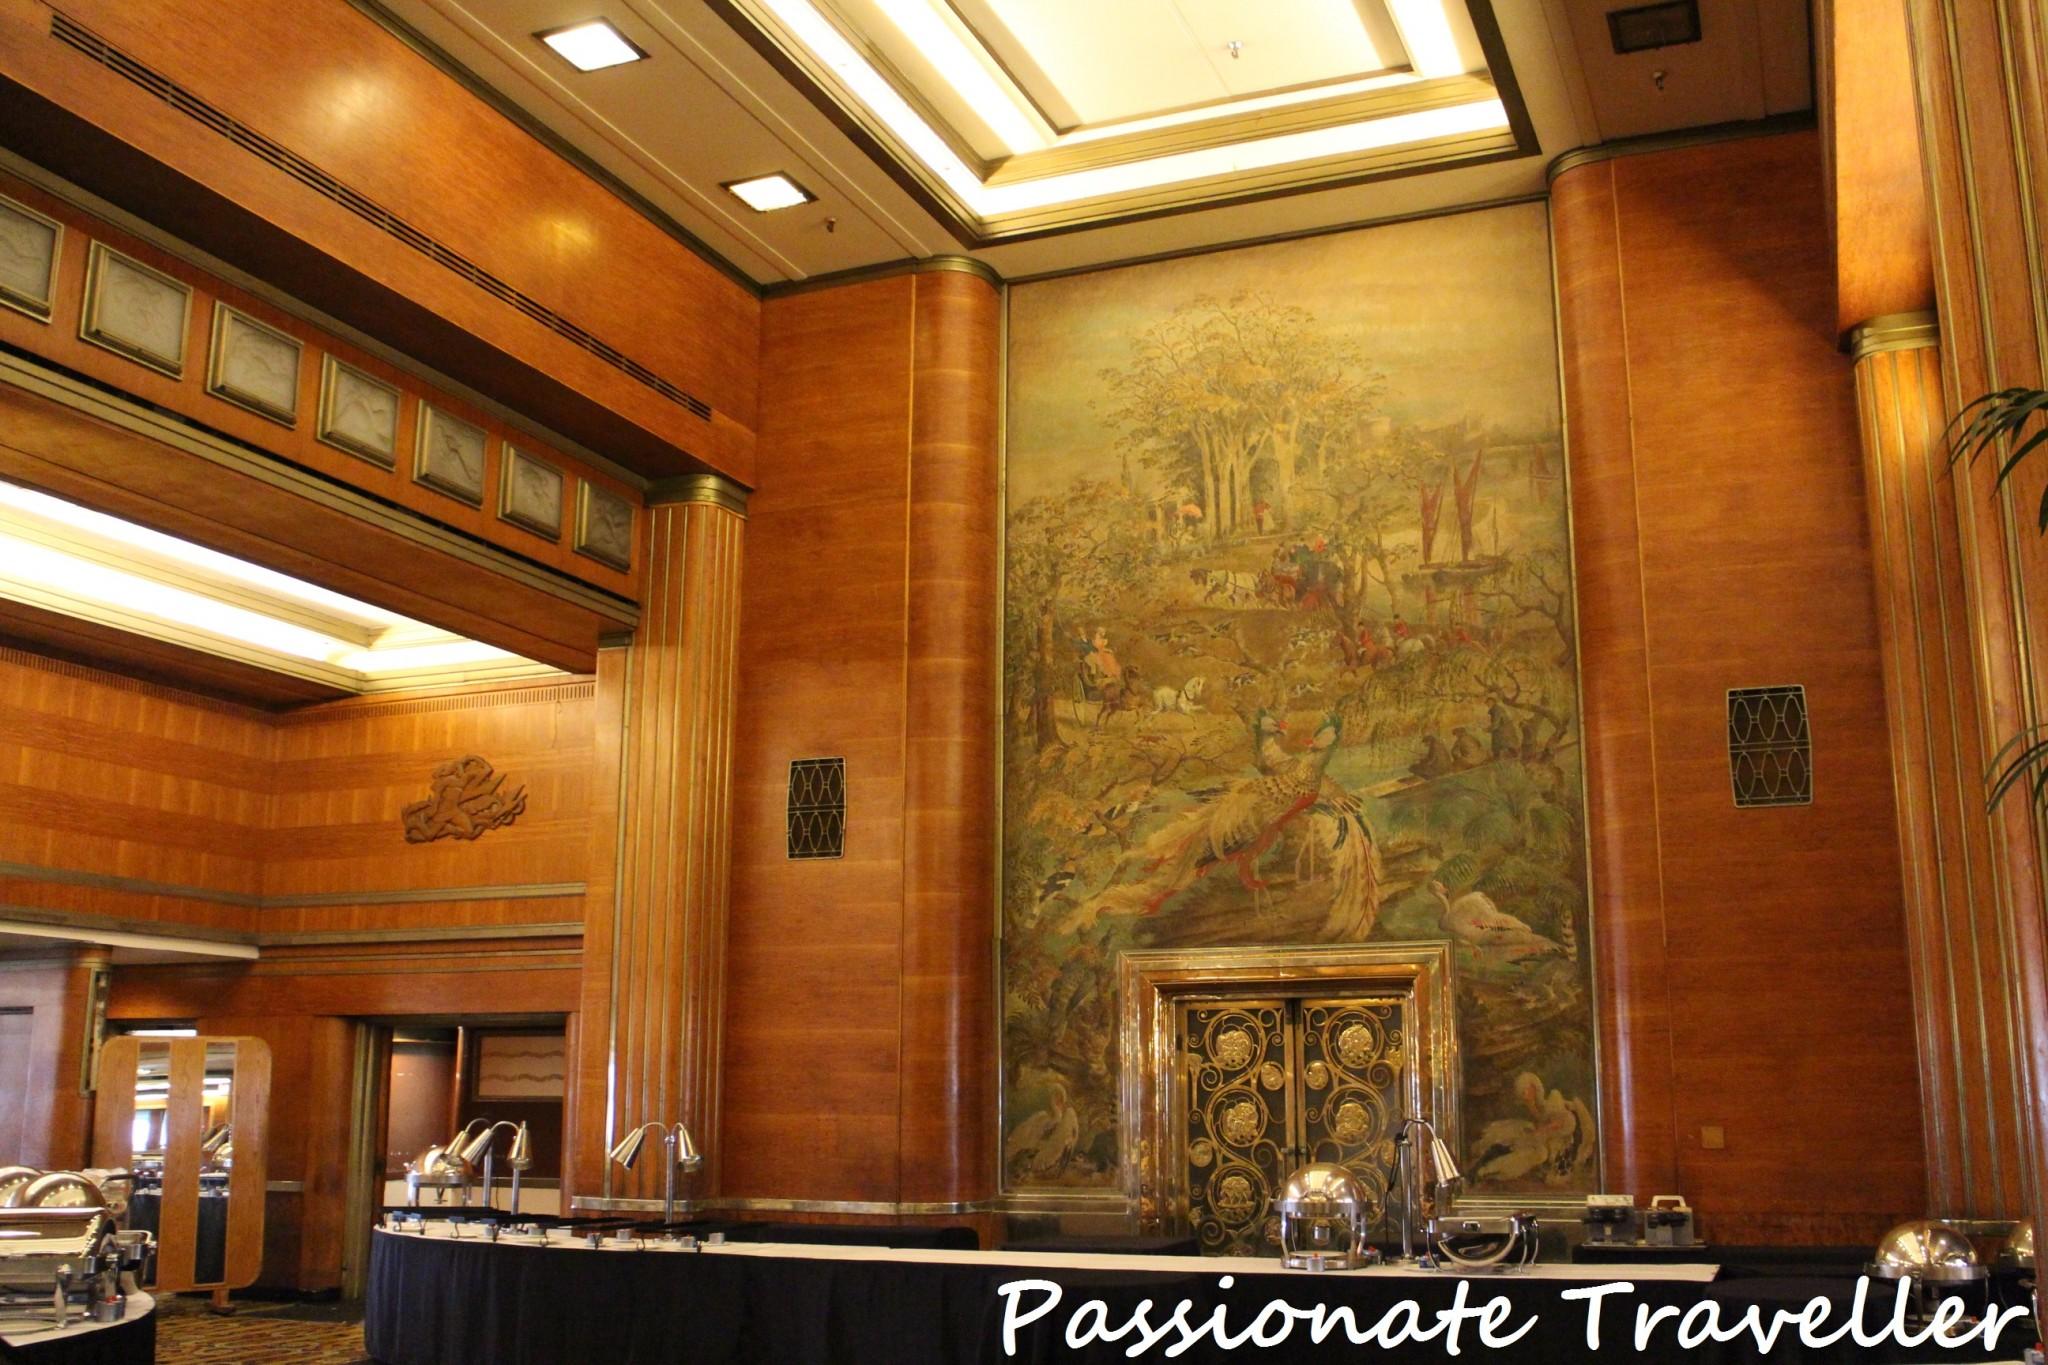 Queen Mary Interior 7